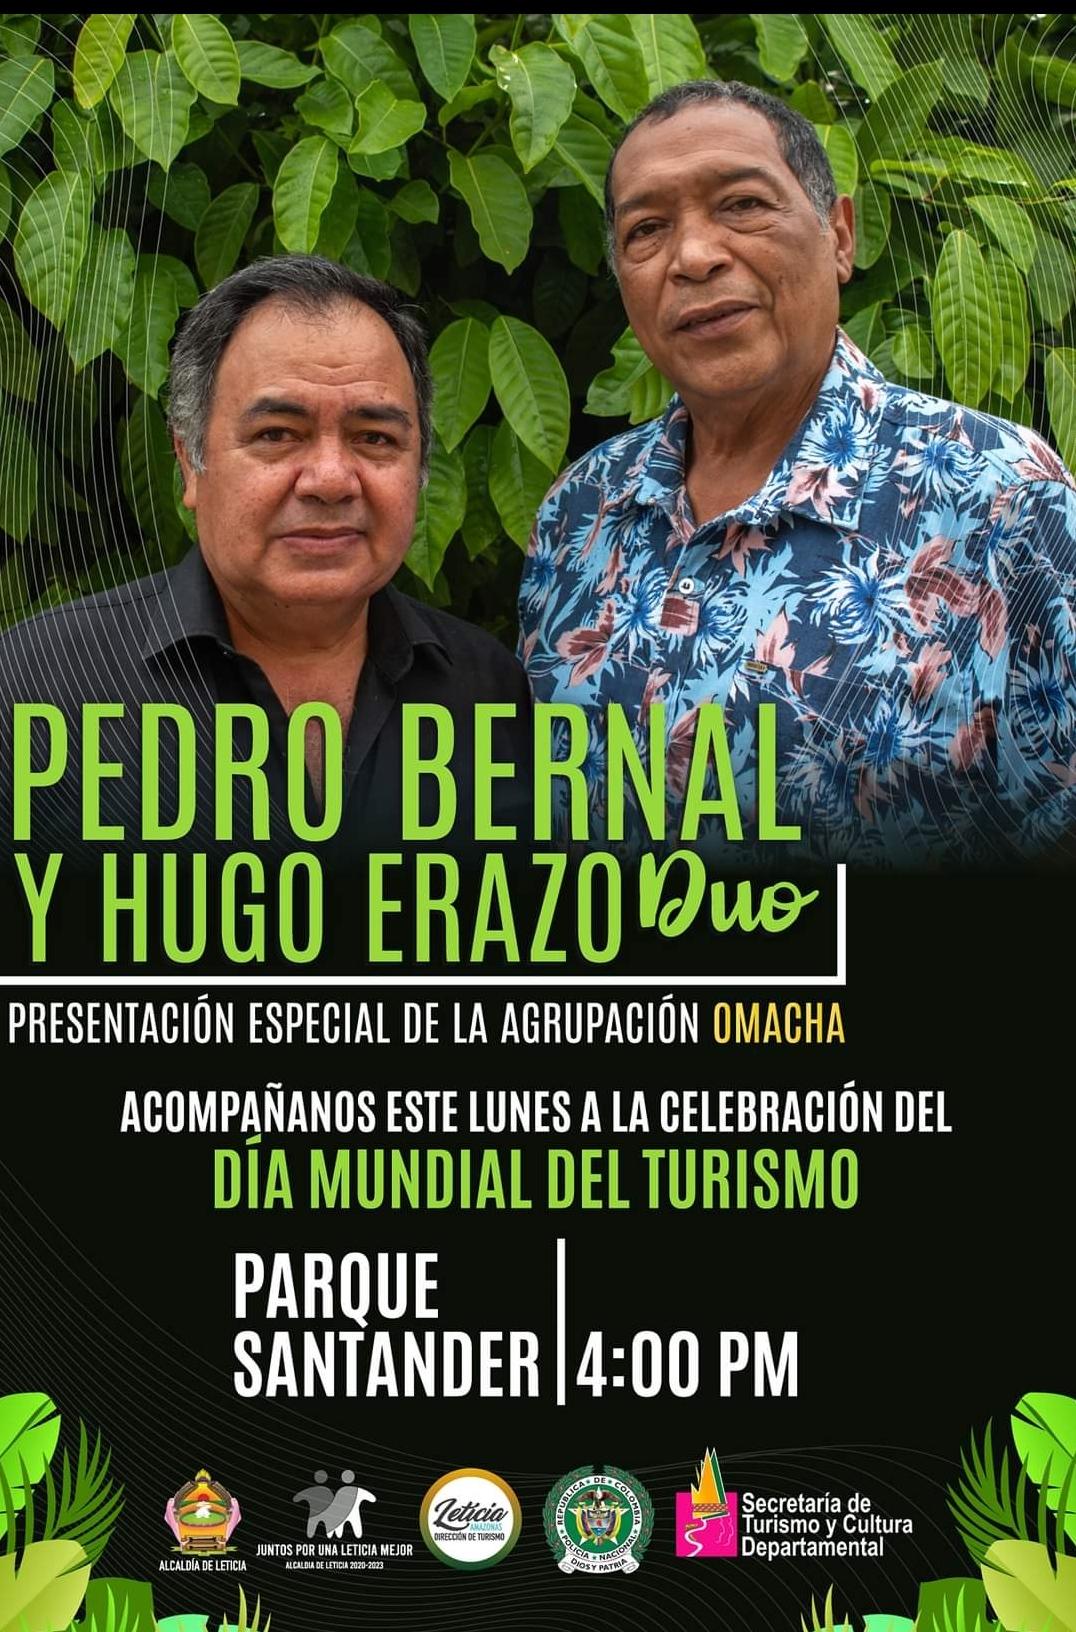 Pedro Bernal y Hugo Erazo